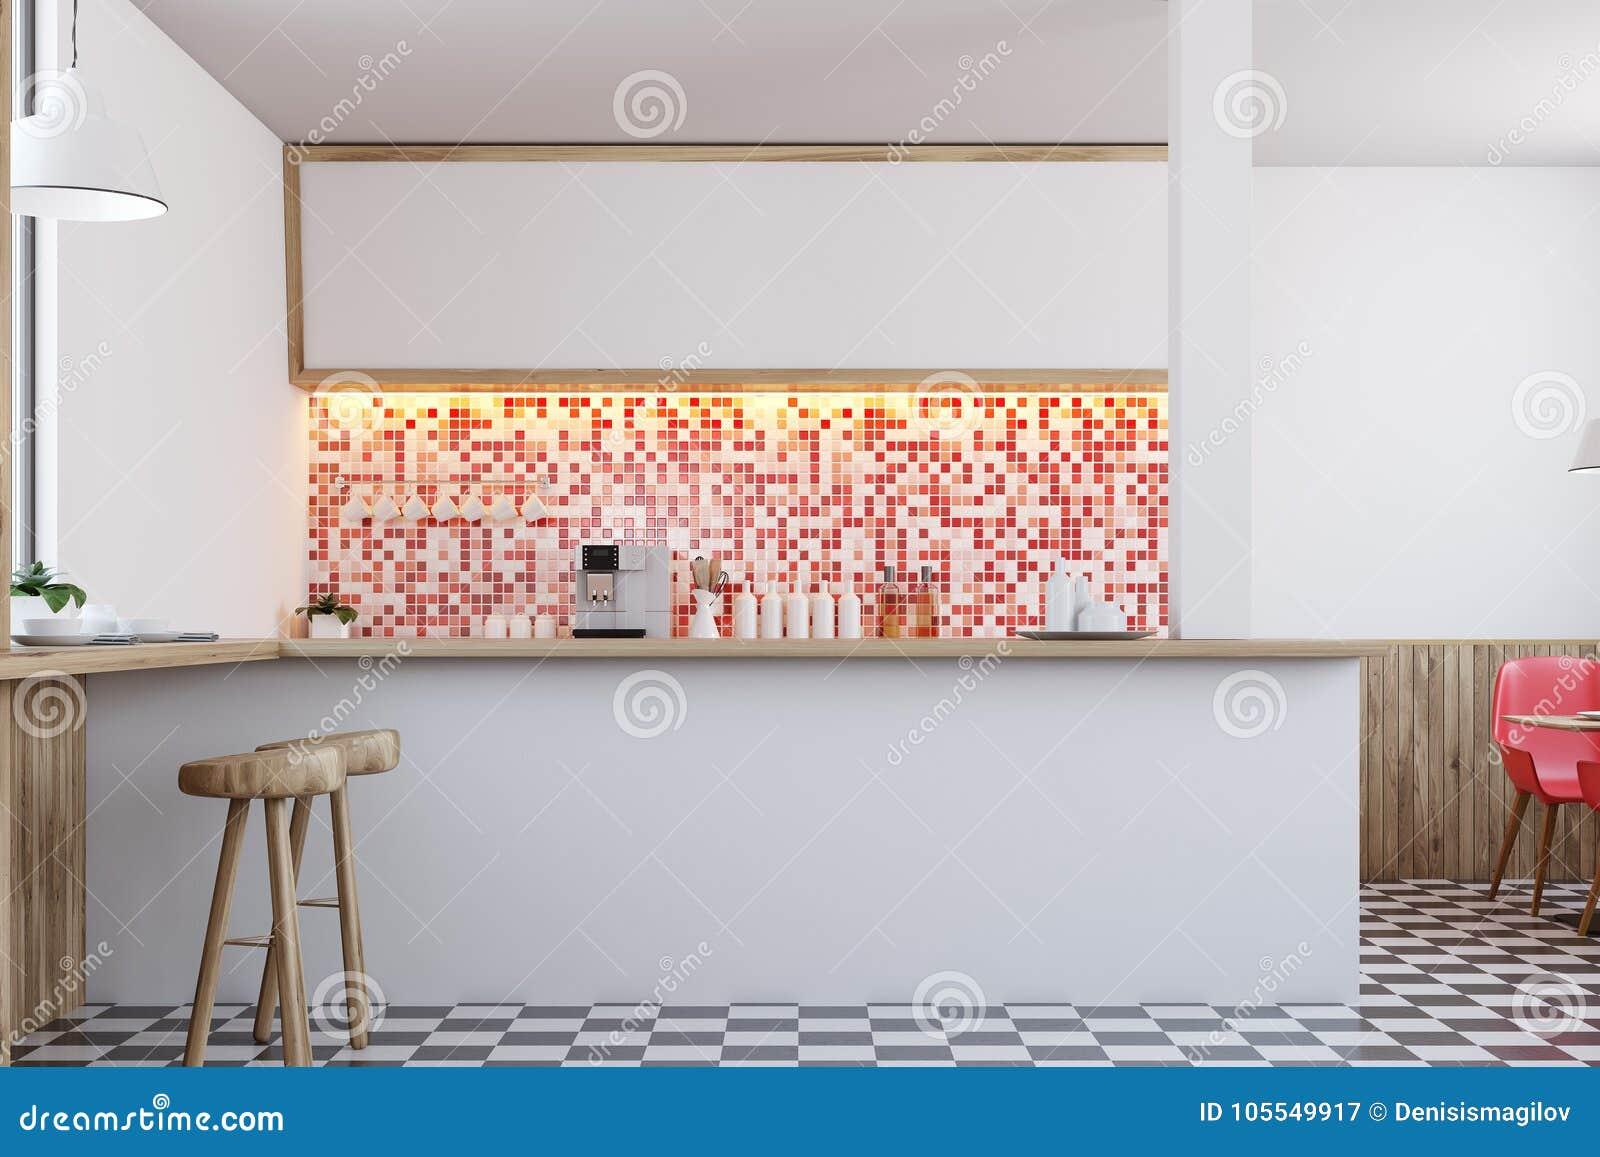 Red Tiles Bar Interior Close Up Stock Illustration - Illustration of ...